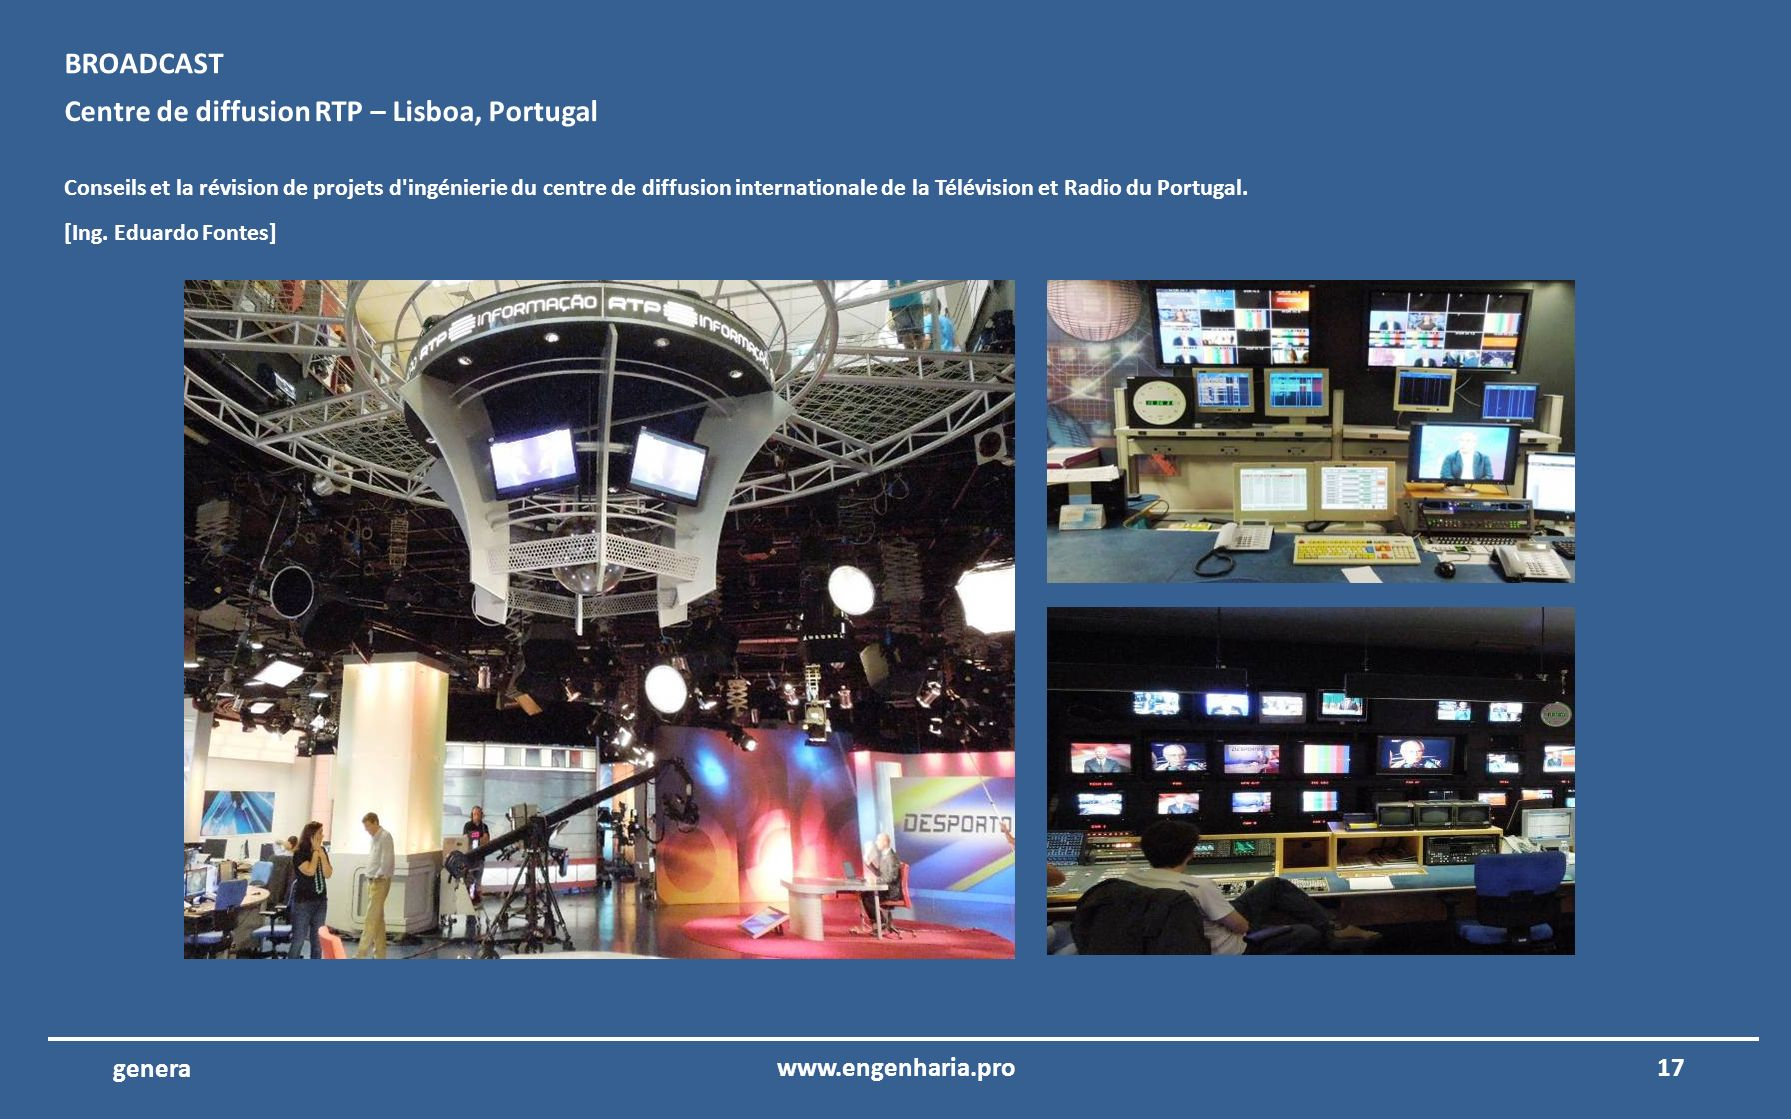 16www.engenharia.pro genera TourTotal Fina ELF – Luanda – Angola Coordination et la supervision des projets d'ingénierie des complexes Total Fina Elf